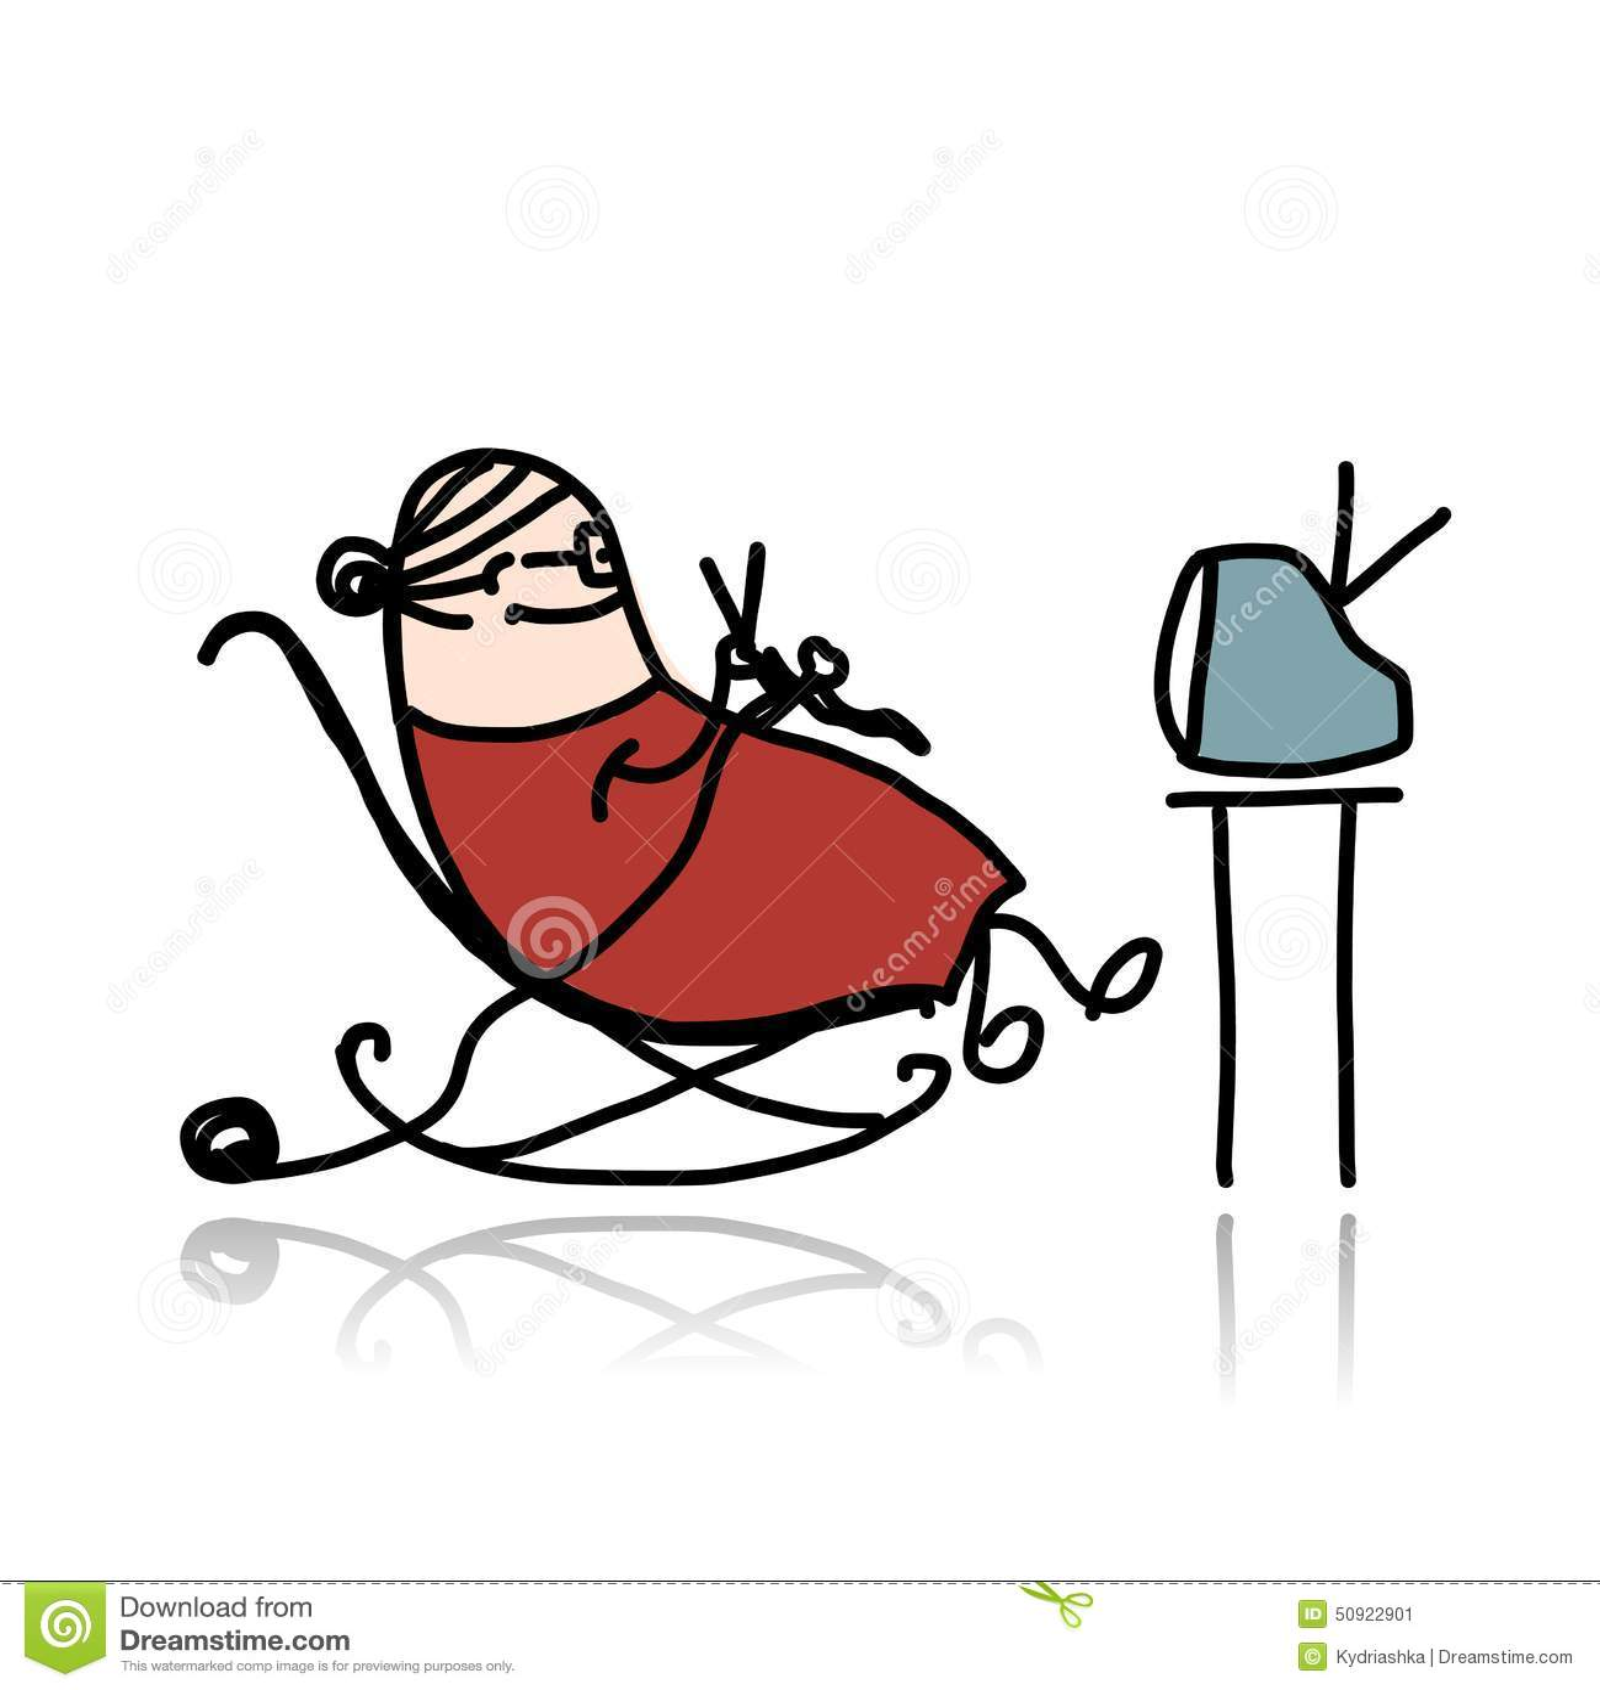 Grandma Knitting Cartoon : Grandmother knitting in armchair and watching tv stock